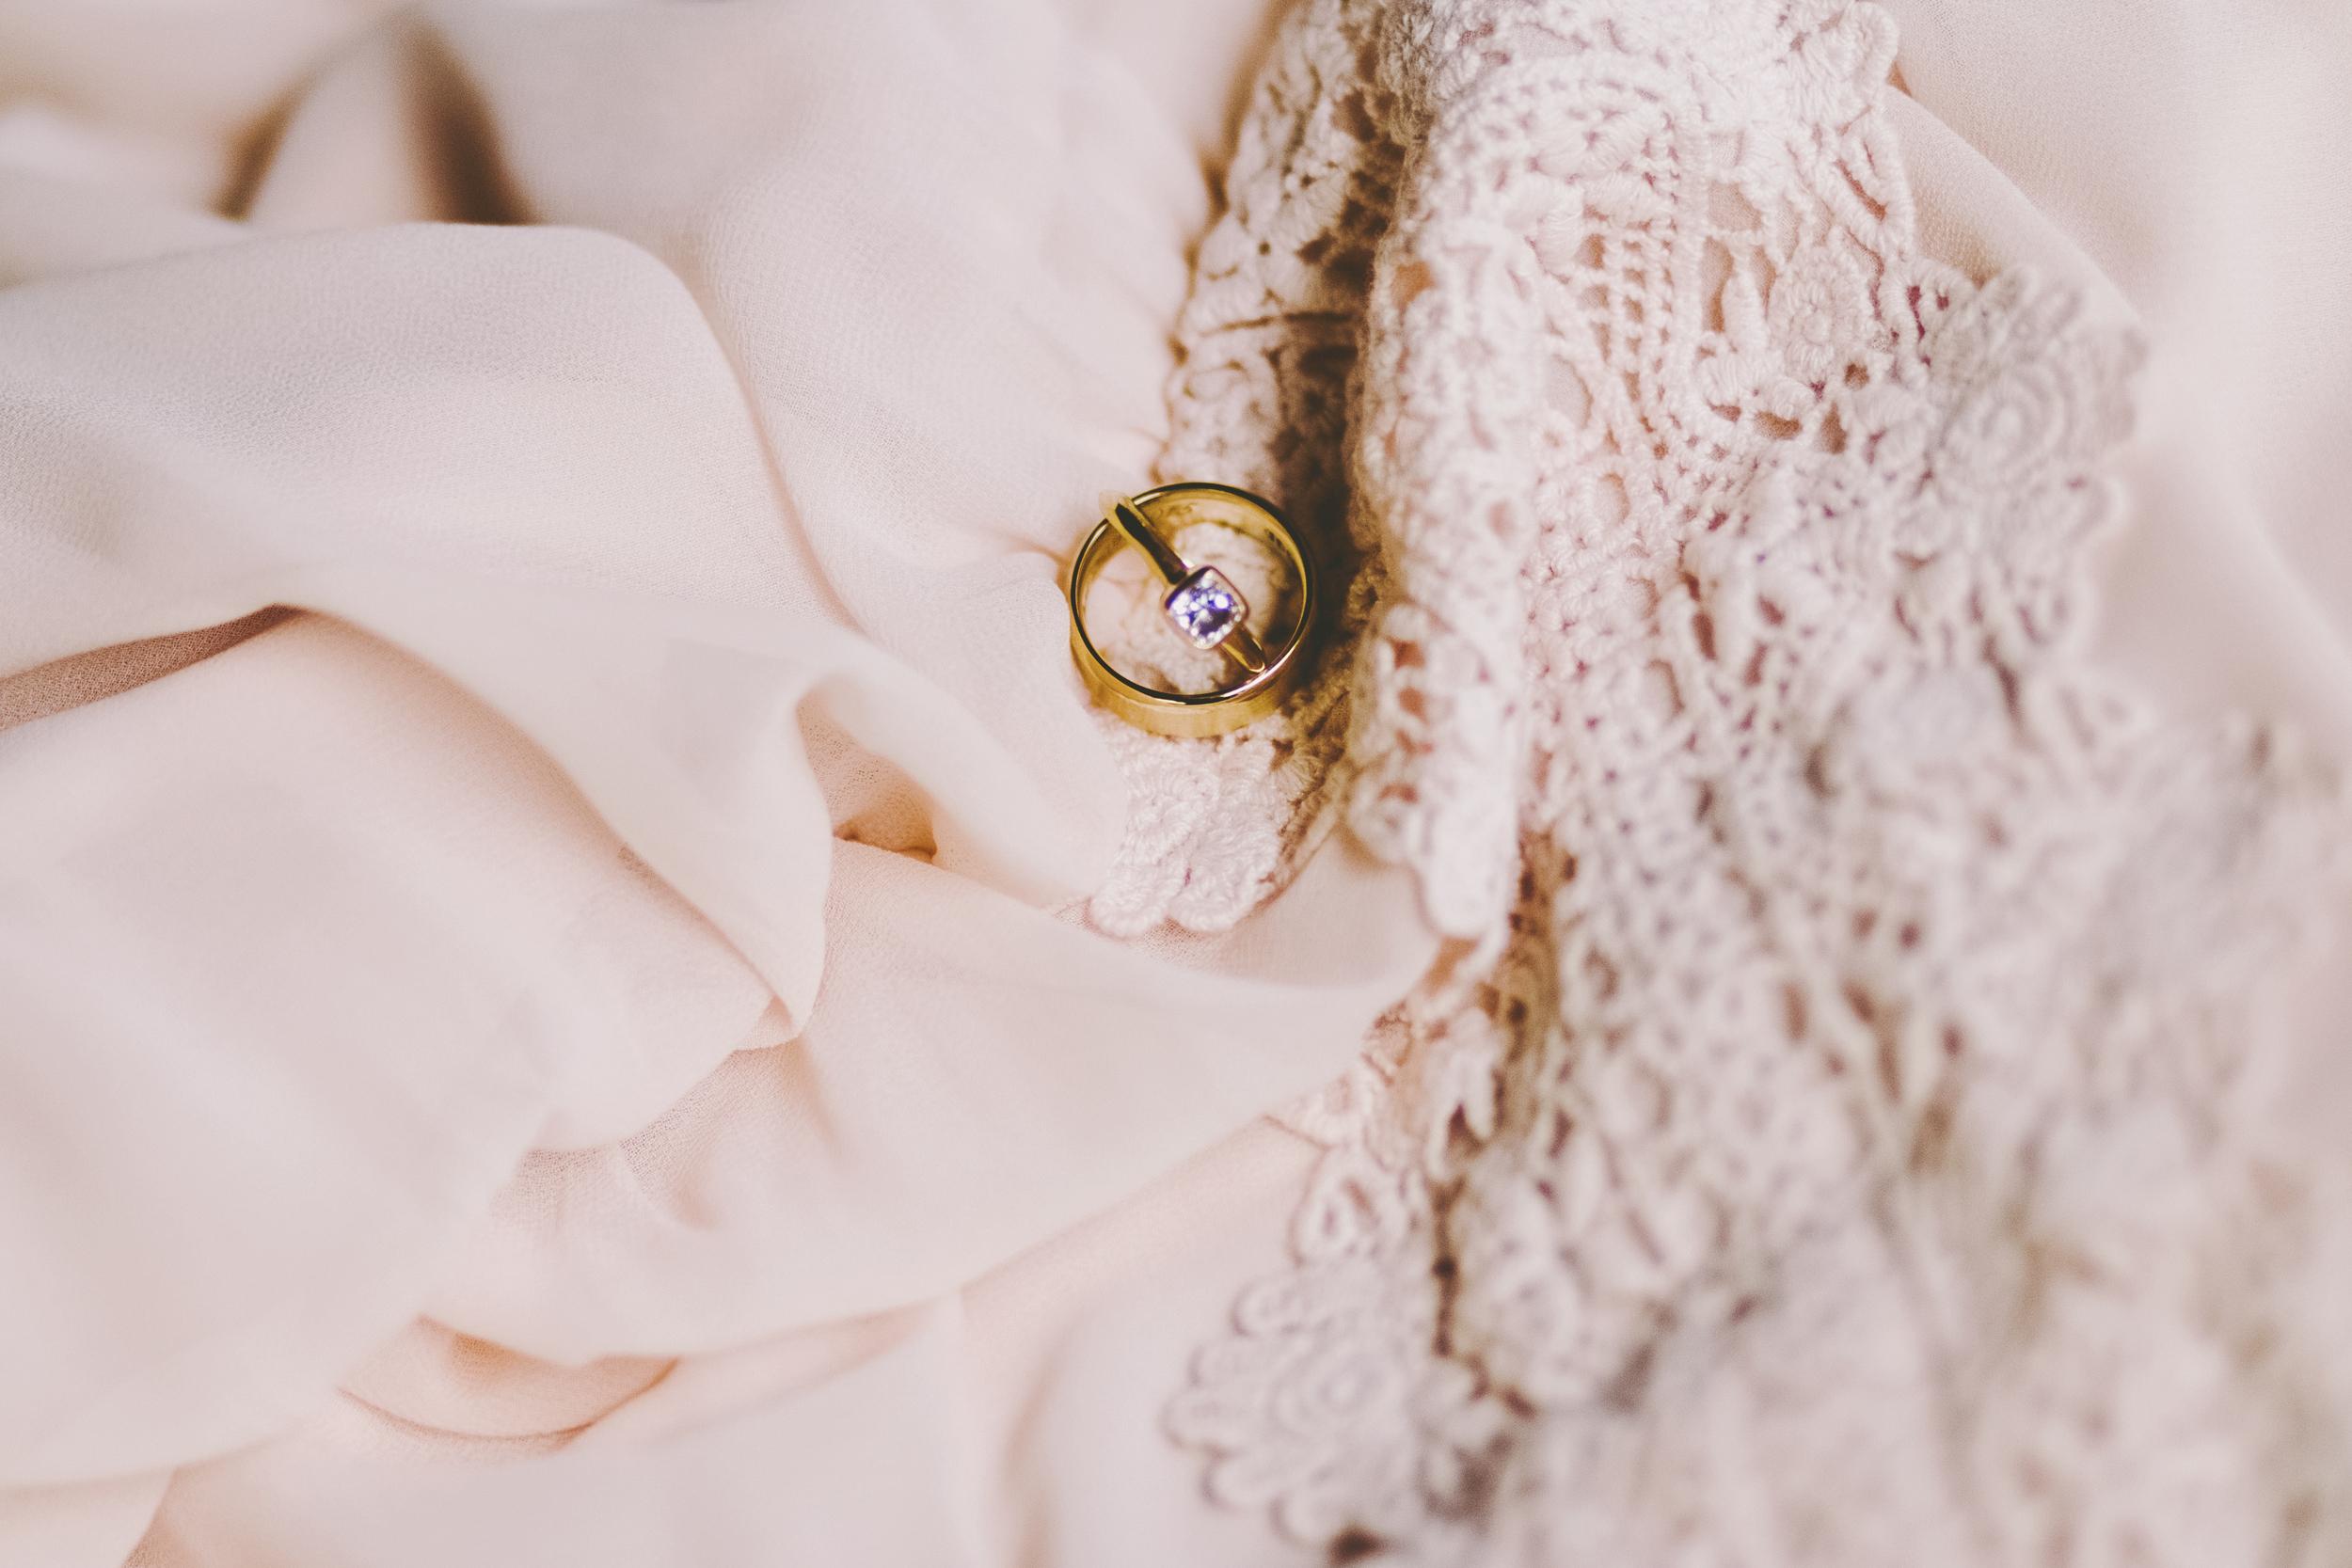 angie-diaz-photography-oahu-hawaii-wedding-tradewinds-ranch-06.jpg